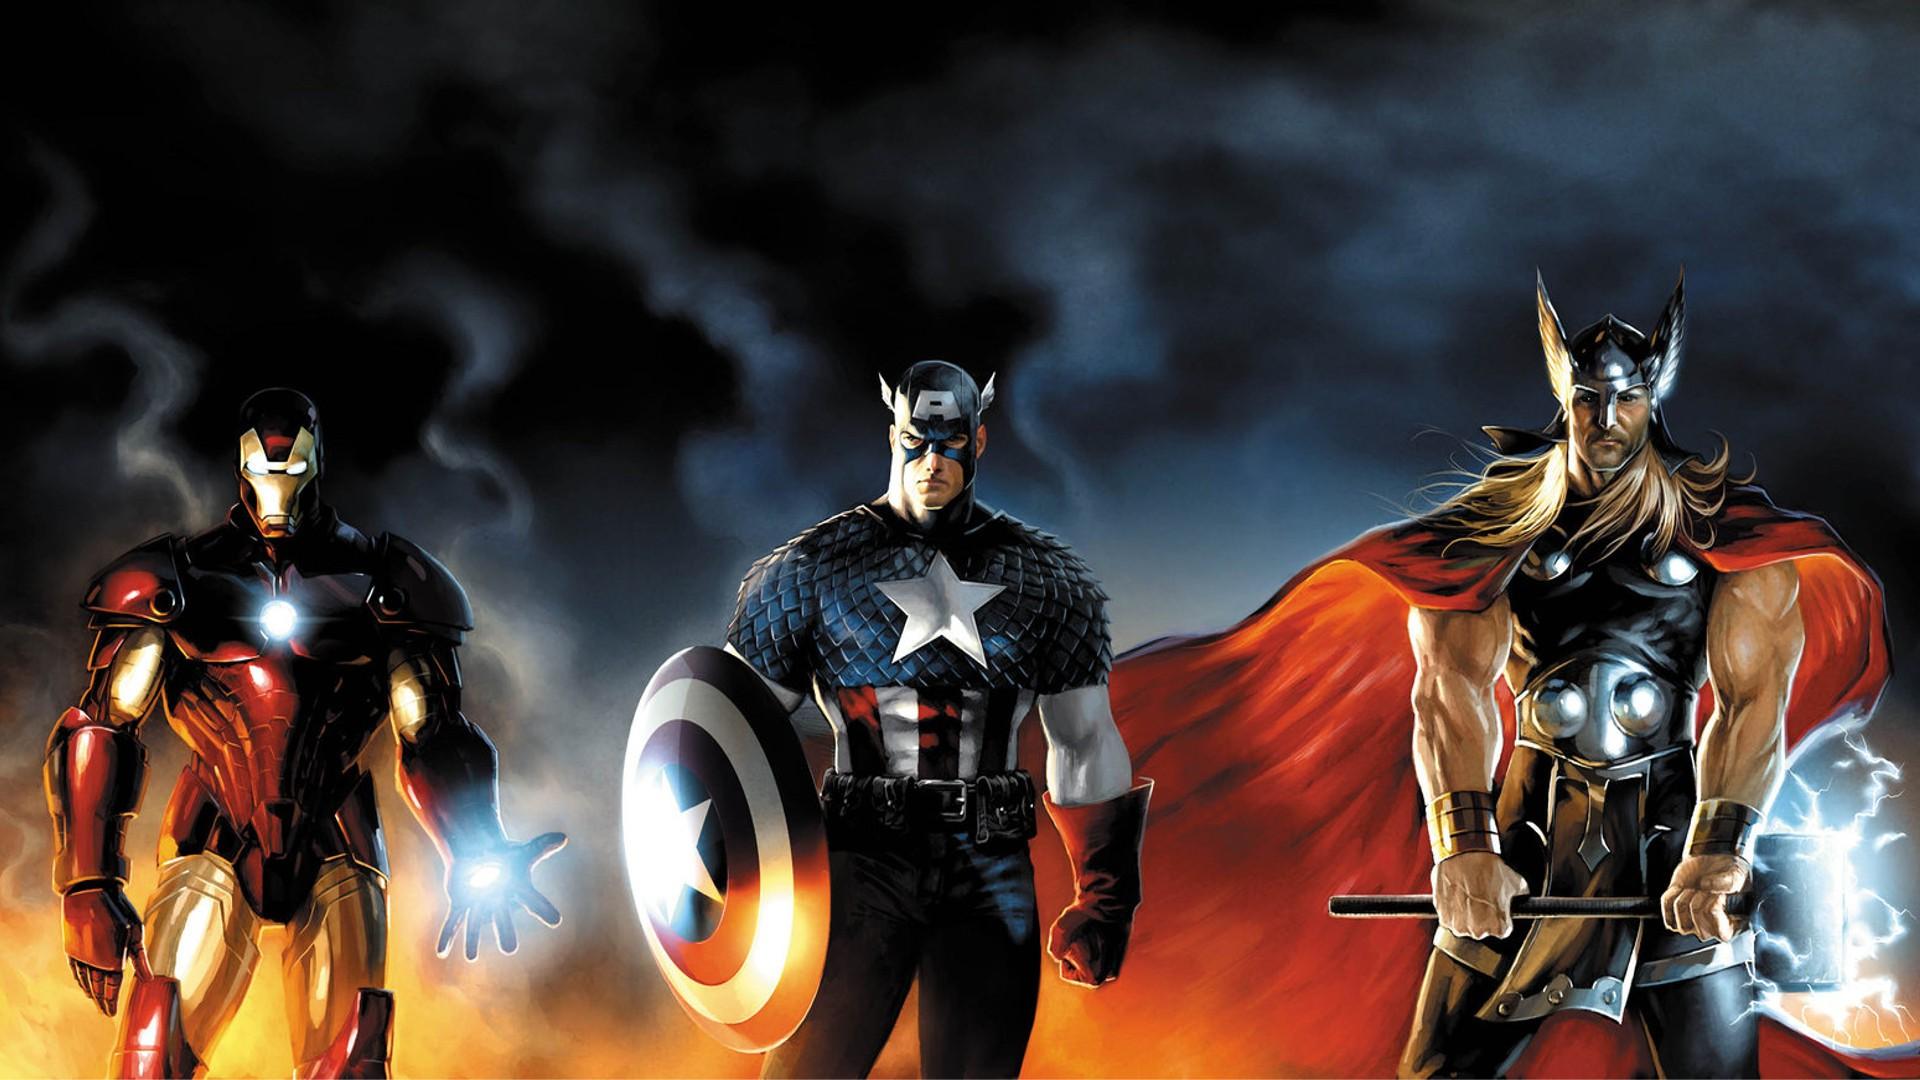 Wallpaper 1920x1080 Px Captain America Comics Iron Man Thor